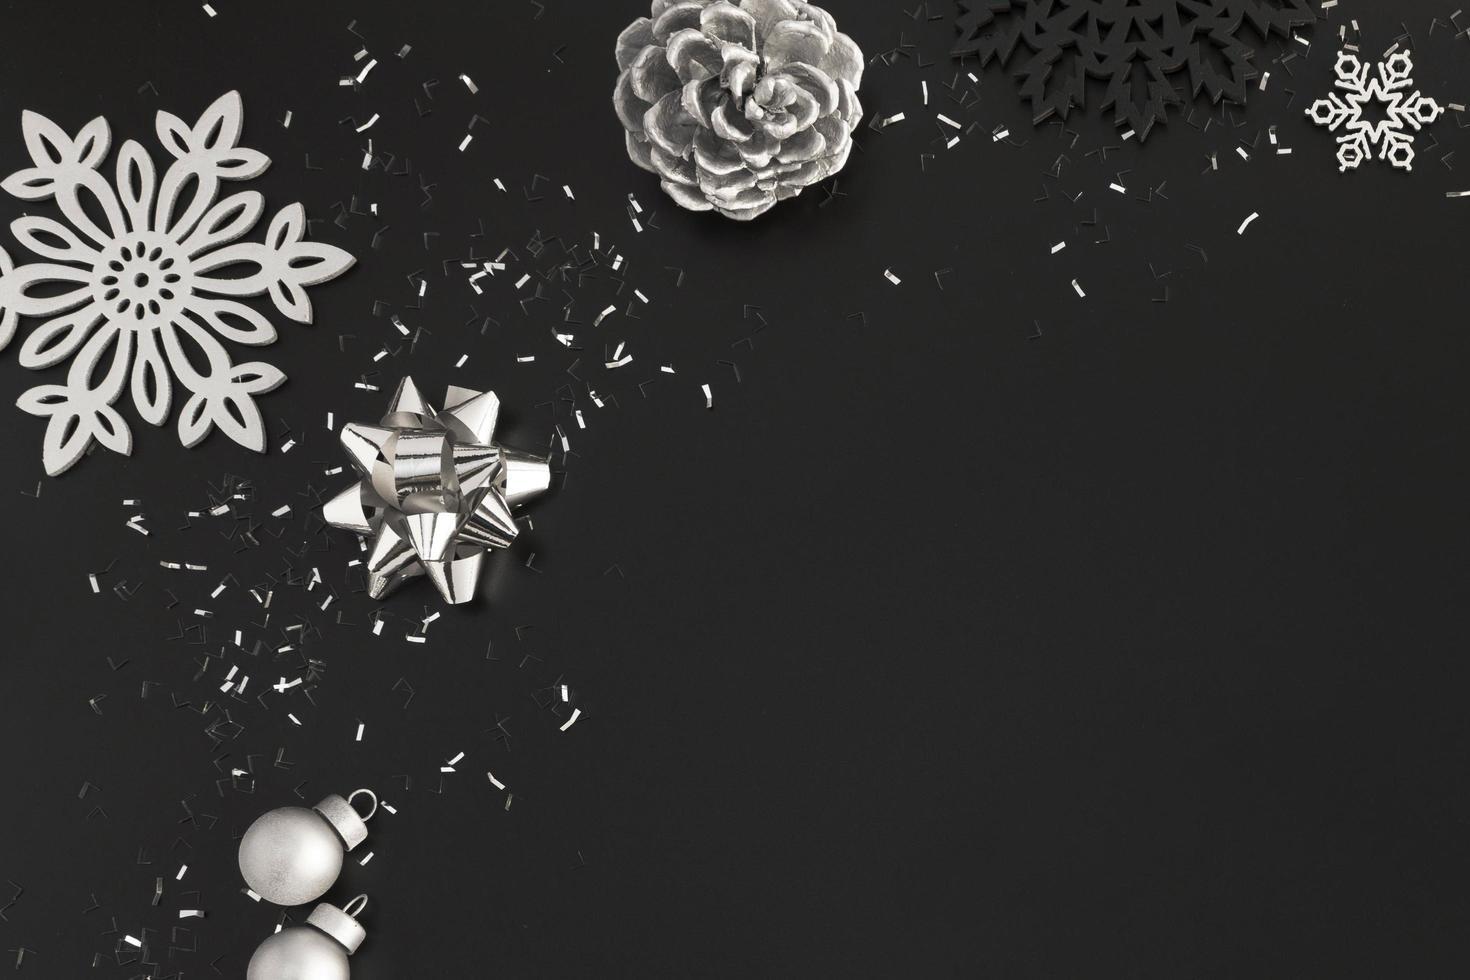 zilveren kerstdecor op zwart foto